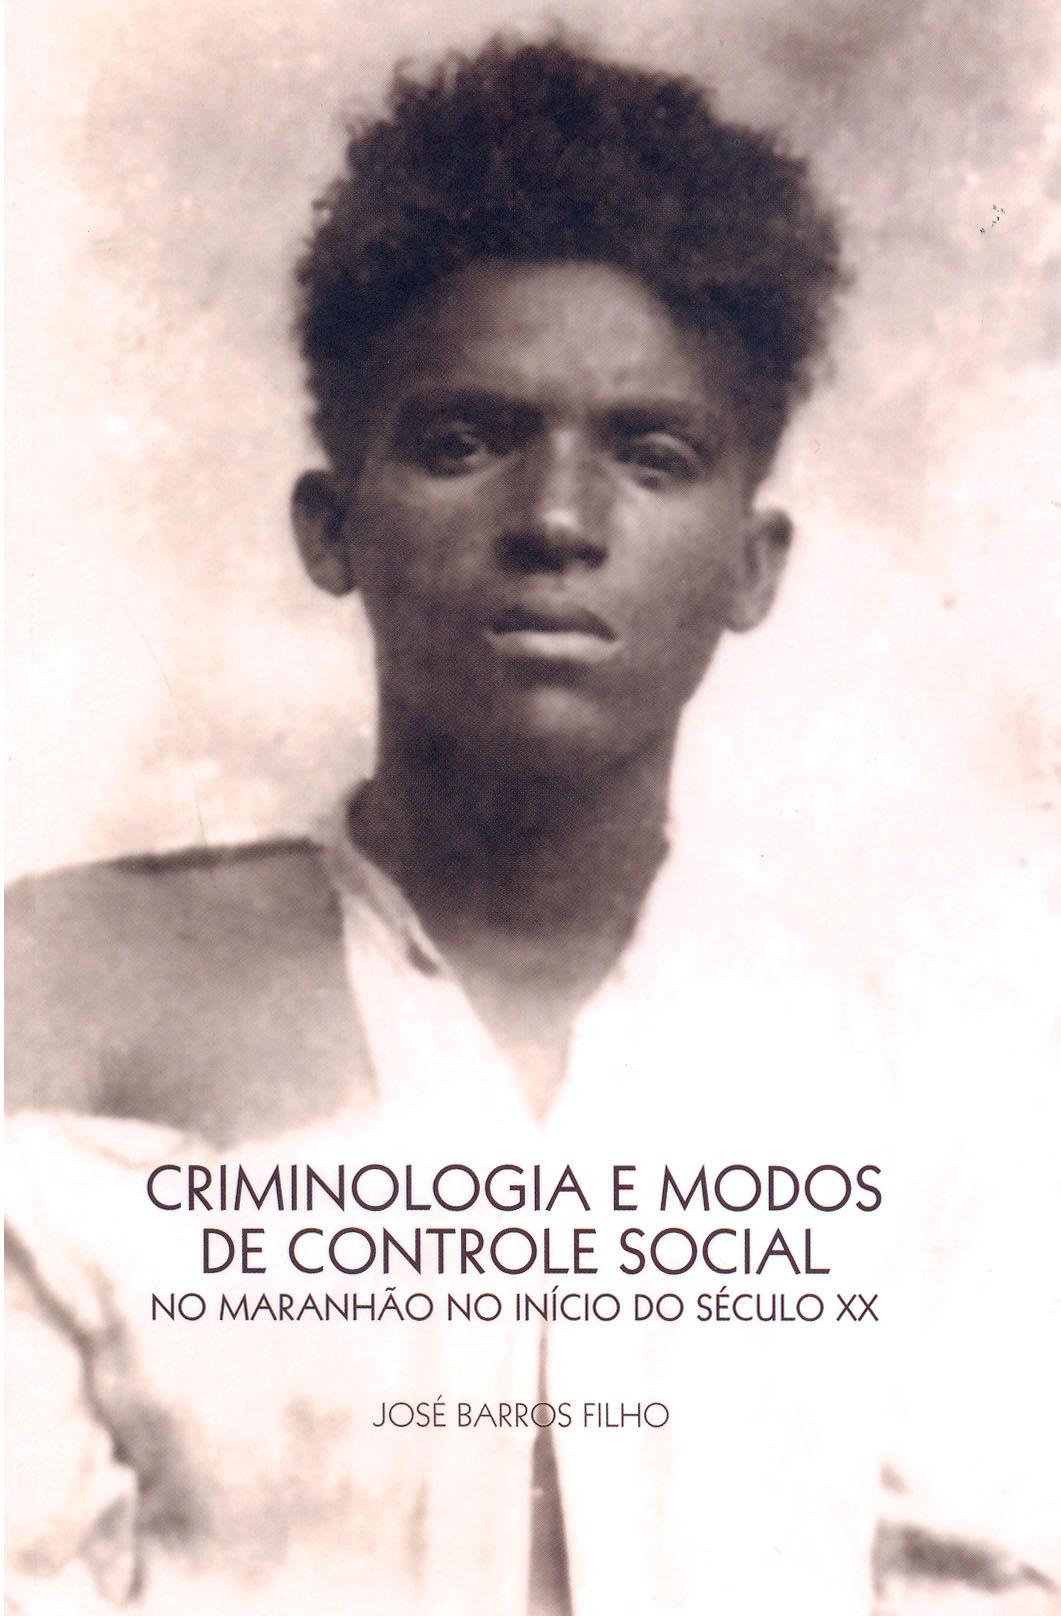 Capa livro Criminologia